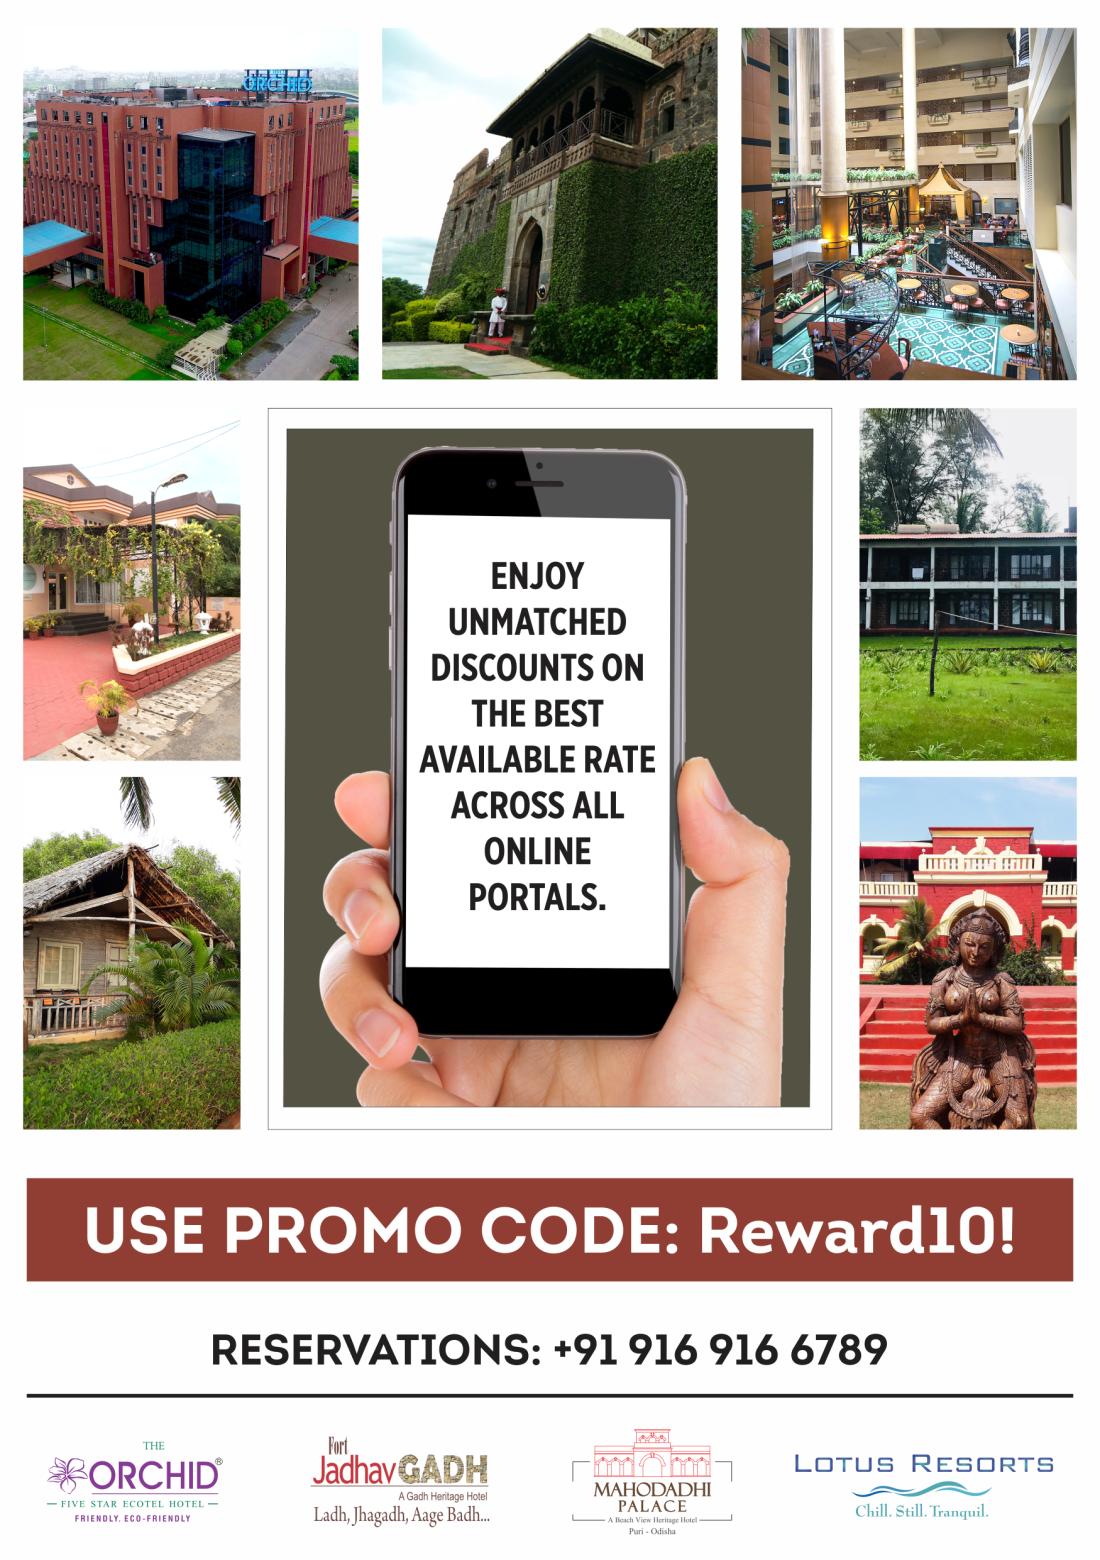 Orchid Rewards Member Special Offer